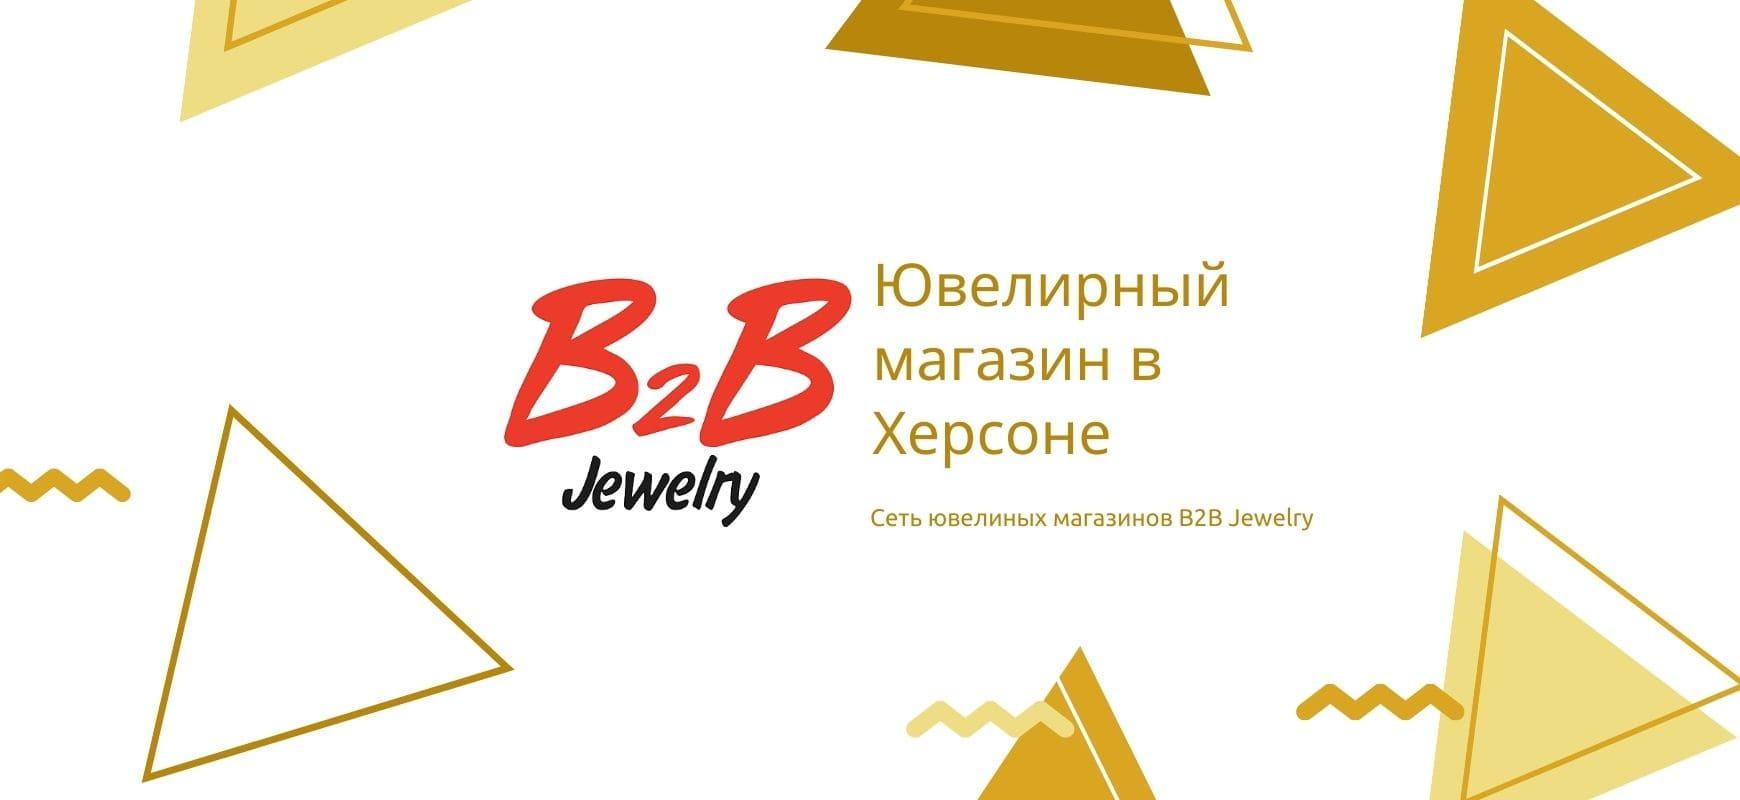 B2B JEWELRY ХЕРСОН